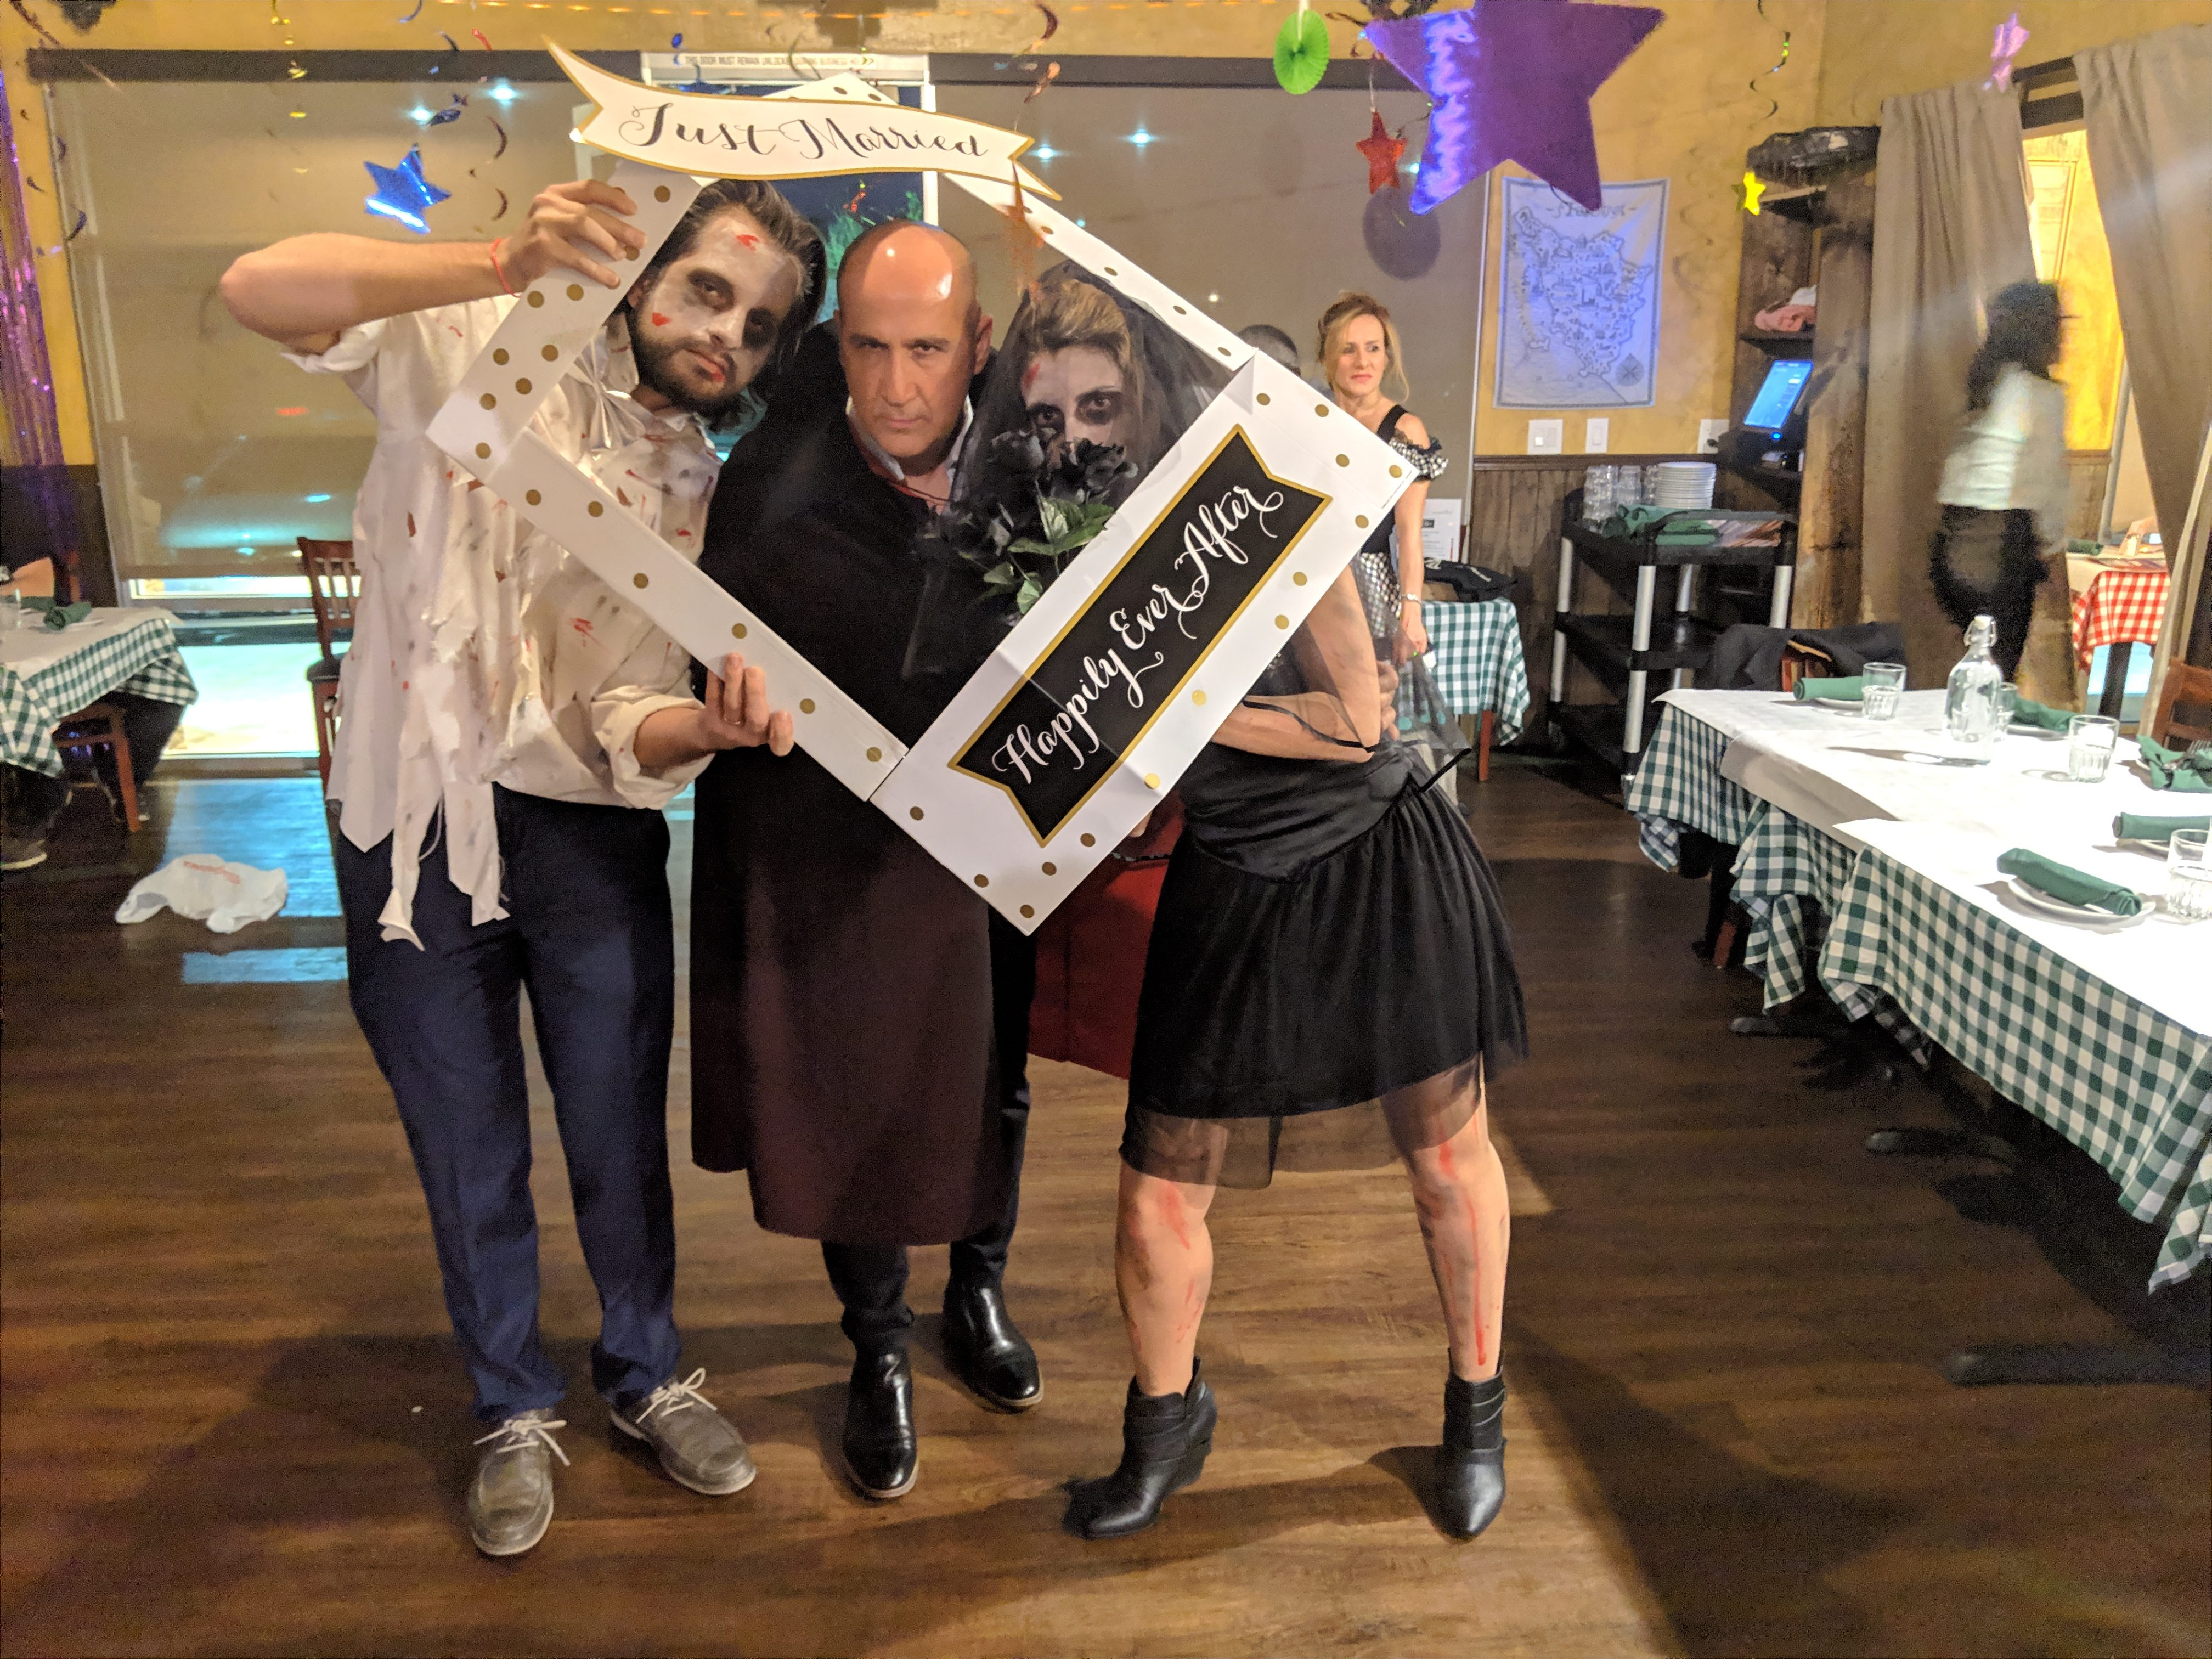 Italian Masquerade Party